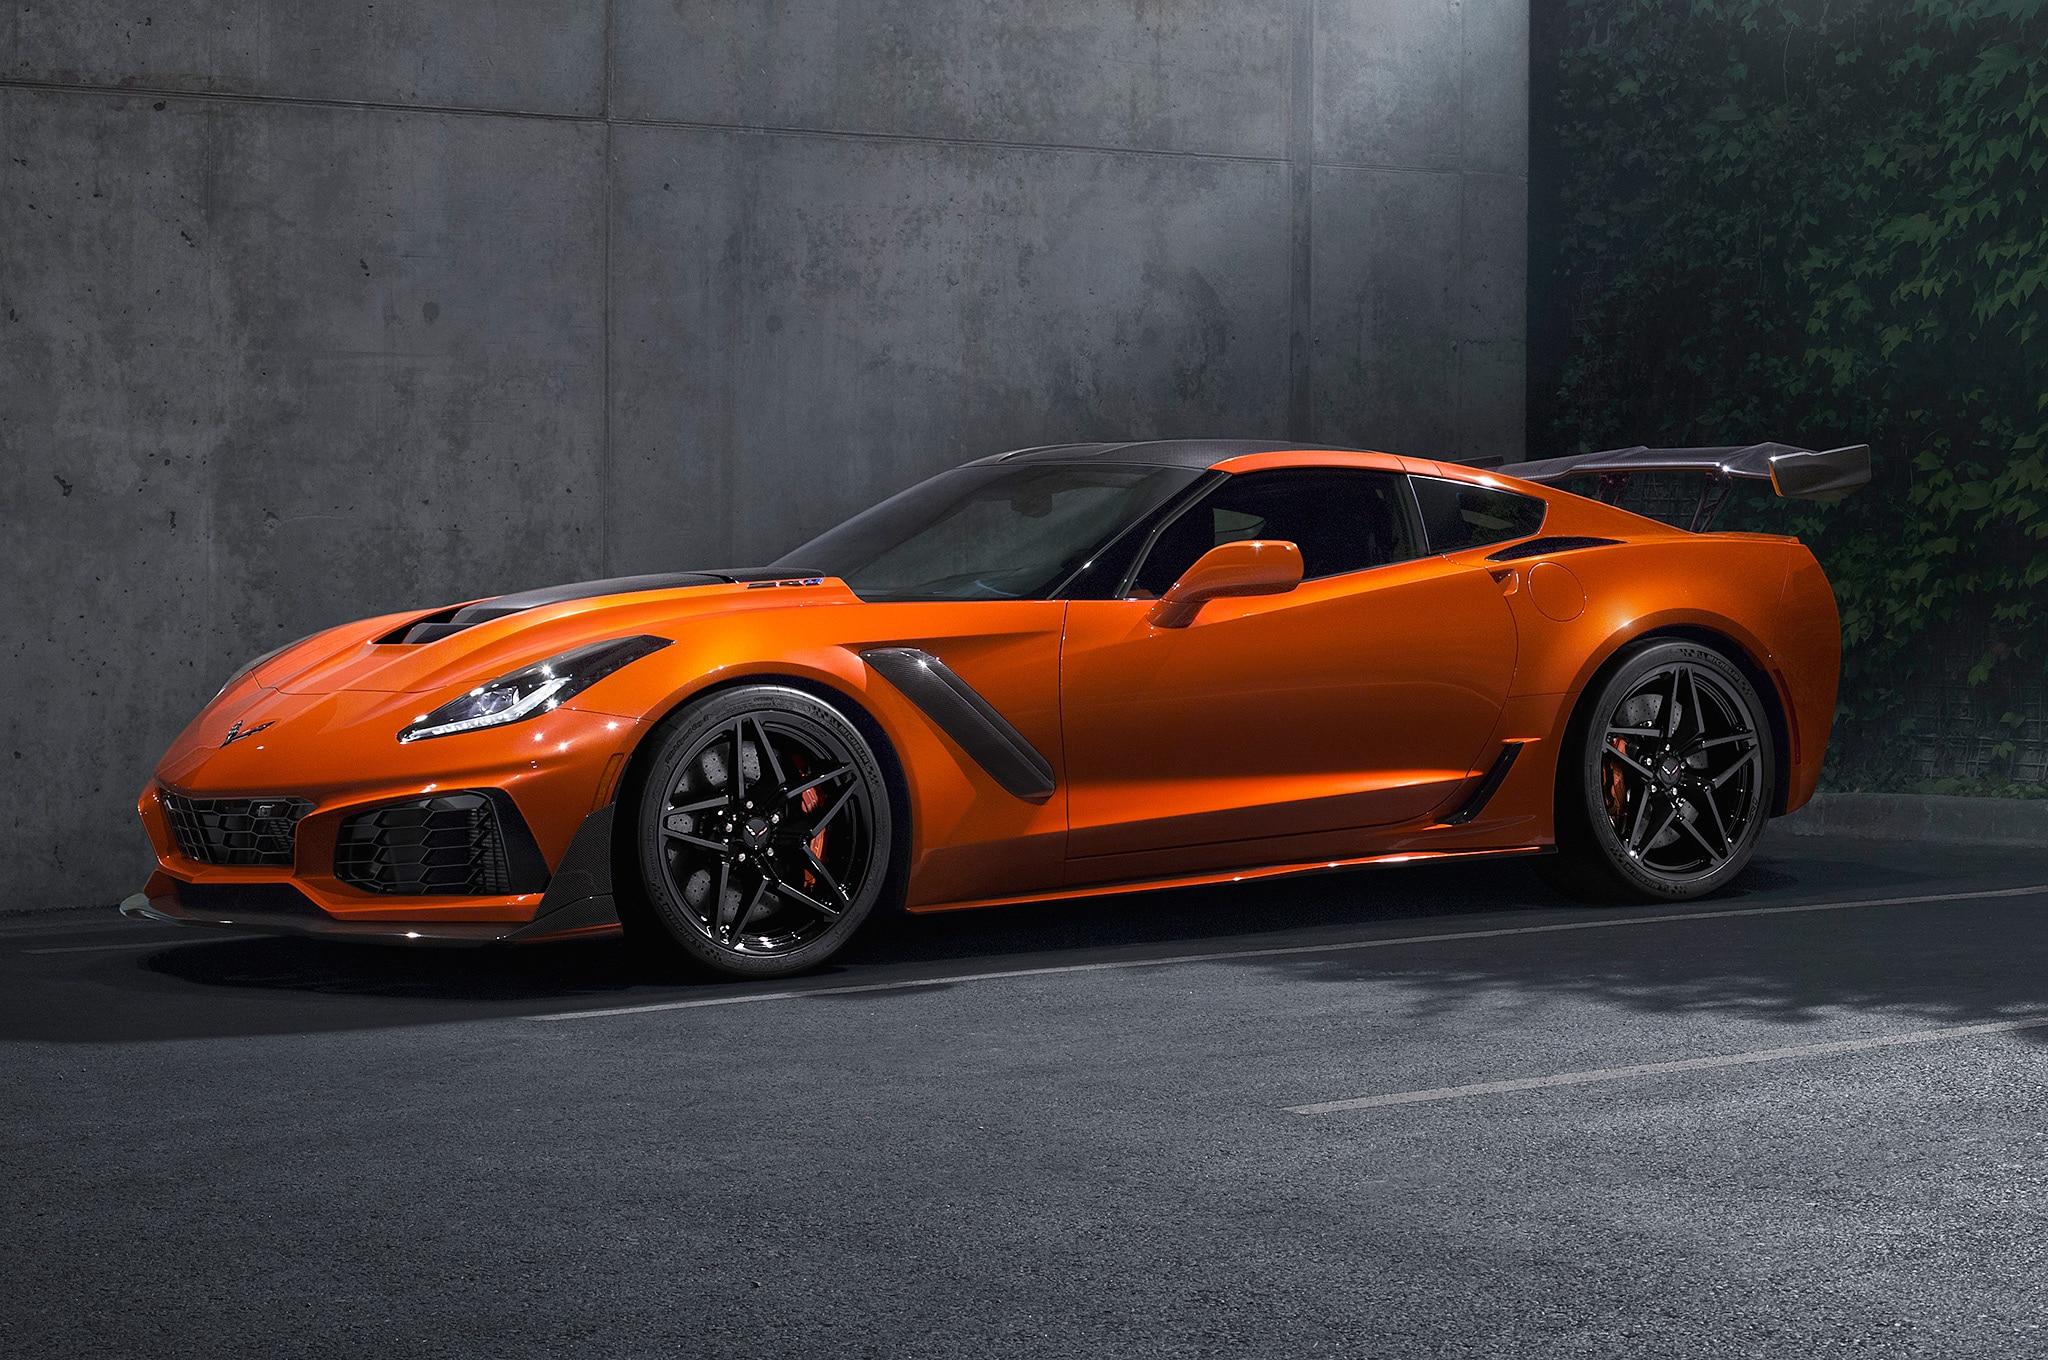 2019 Chevrolet Corvette ZR1 Front Three Quarter Sebring Orange